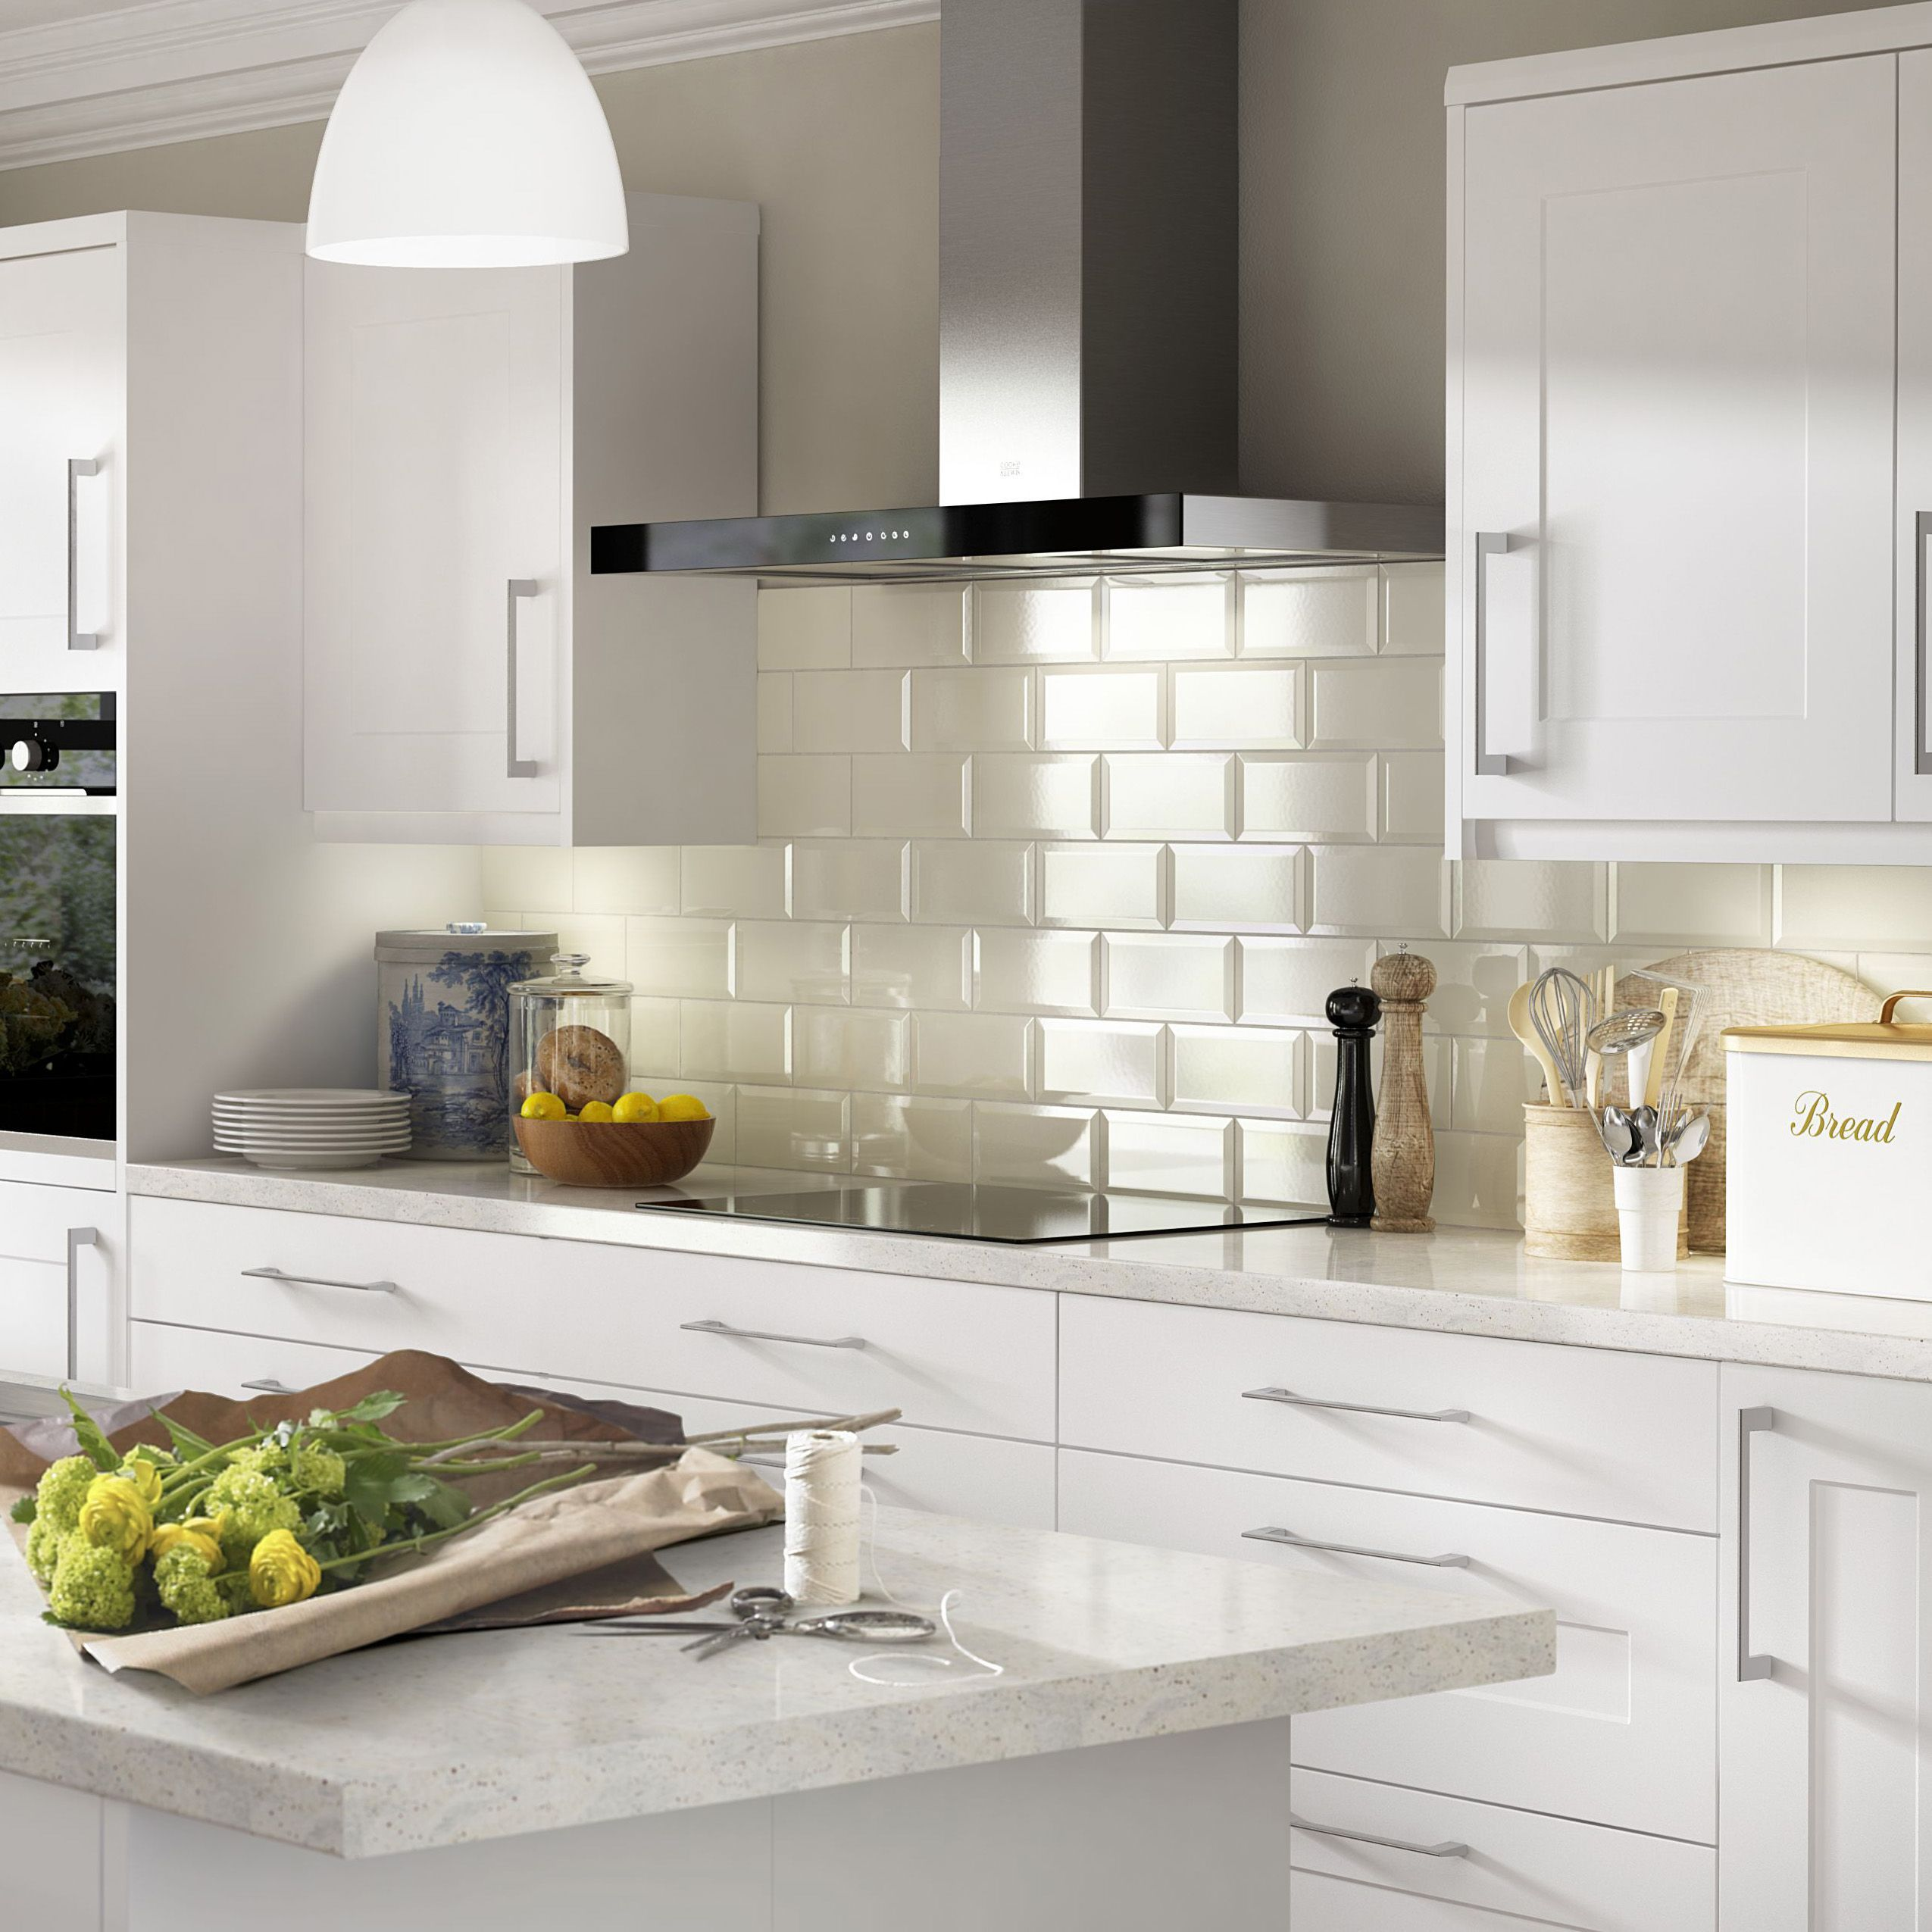 Colours Tiling Banner Image  Kitchen Revamp  Pinterest  Color Alluring Kitchen Wall Tile Design Ideas